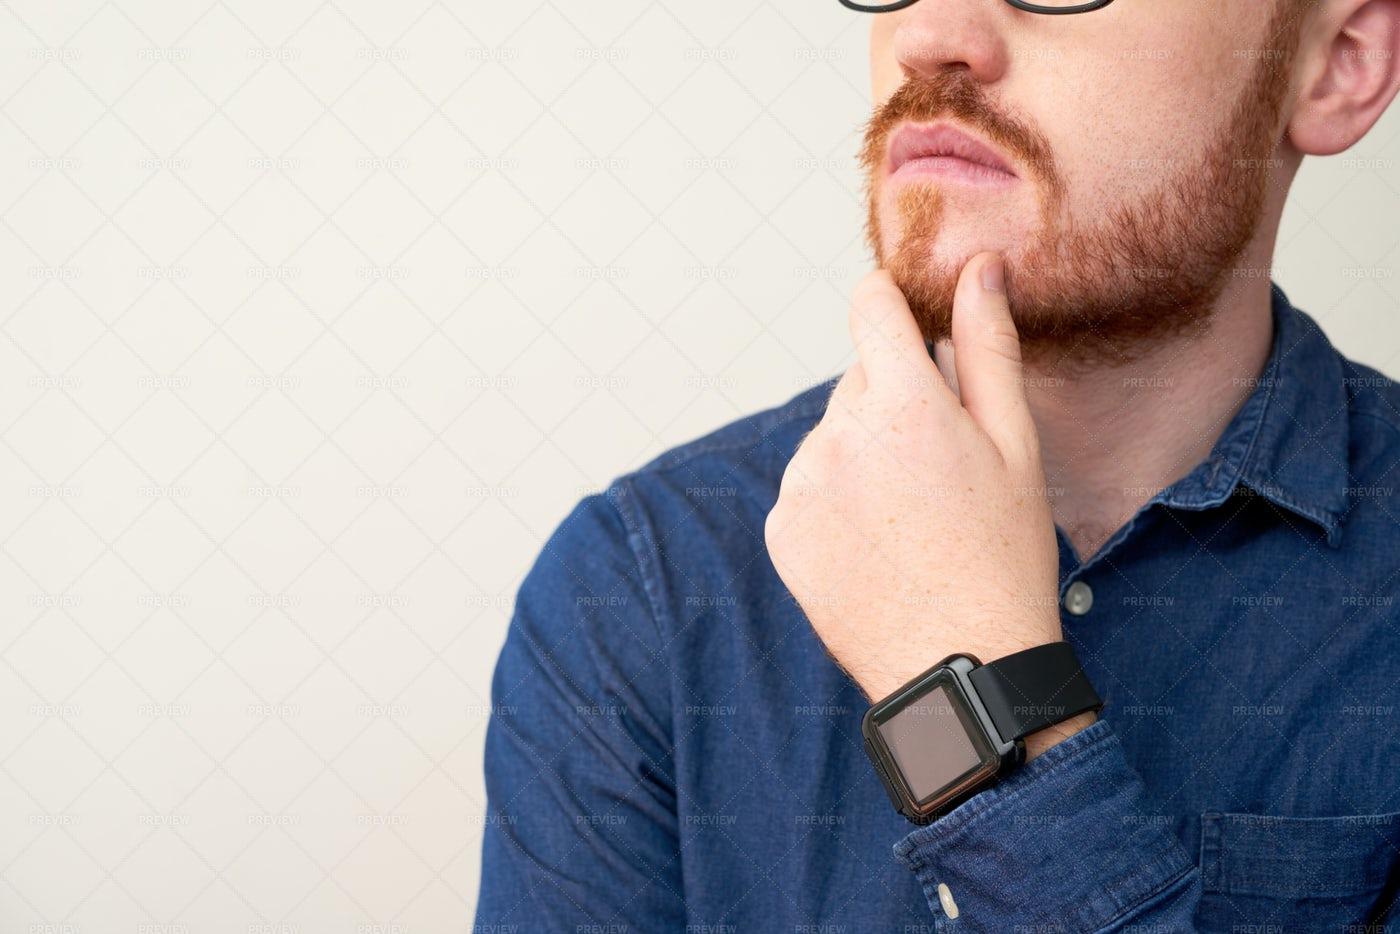 Pensive Man Rubbing Chin: Stock Photos